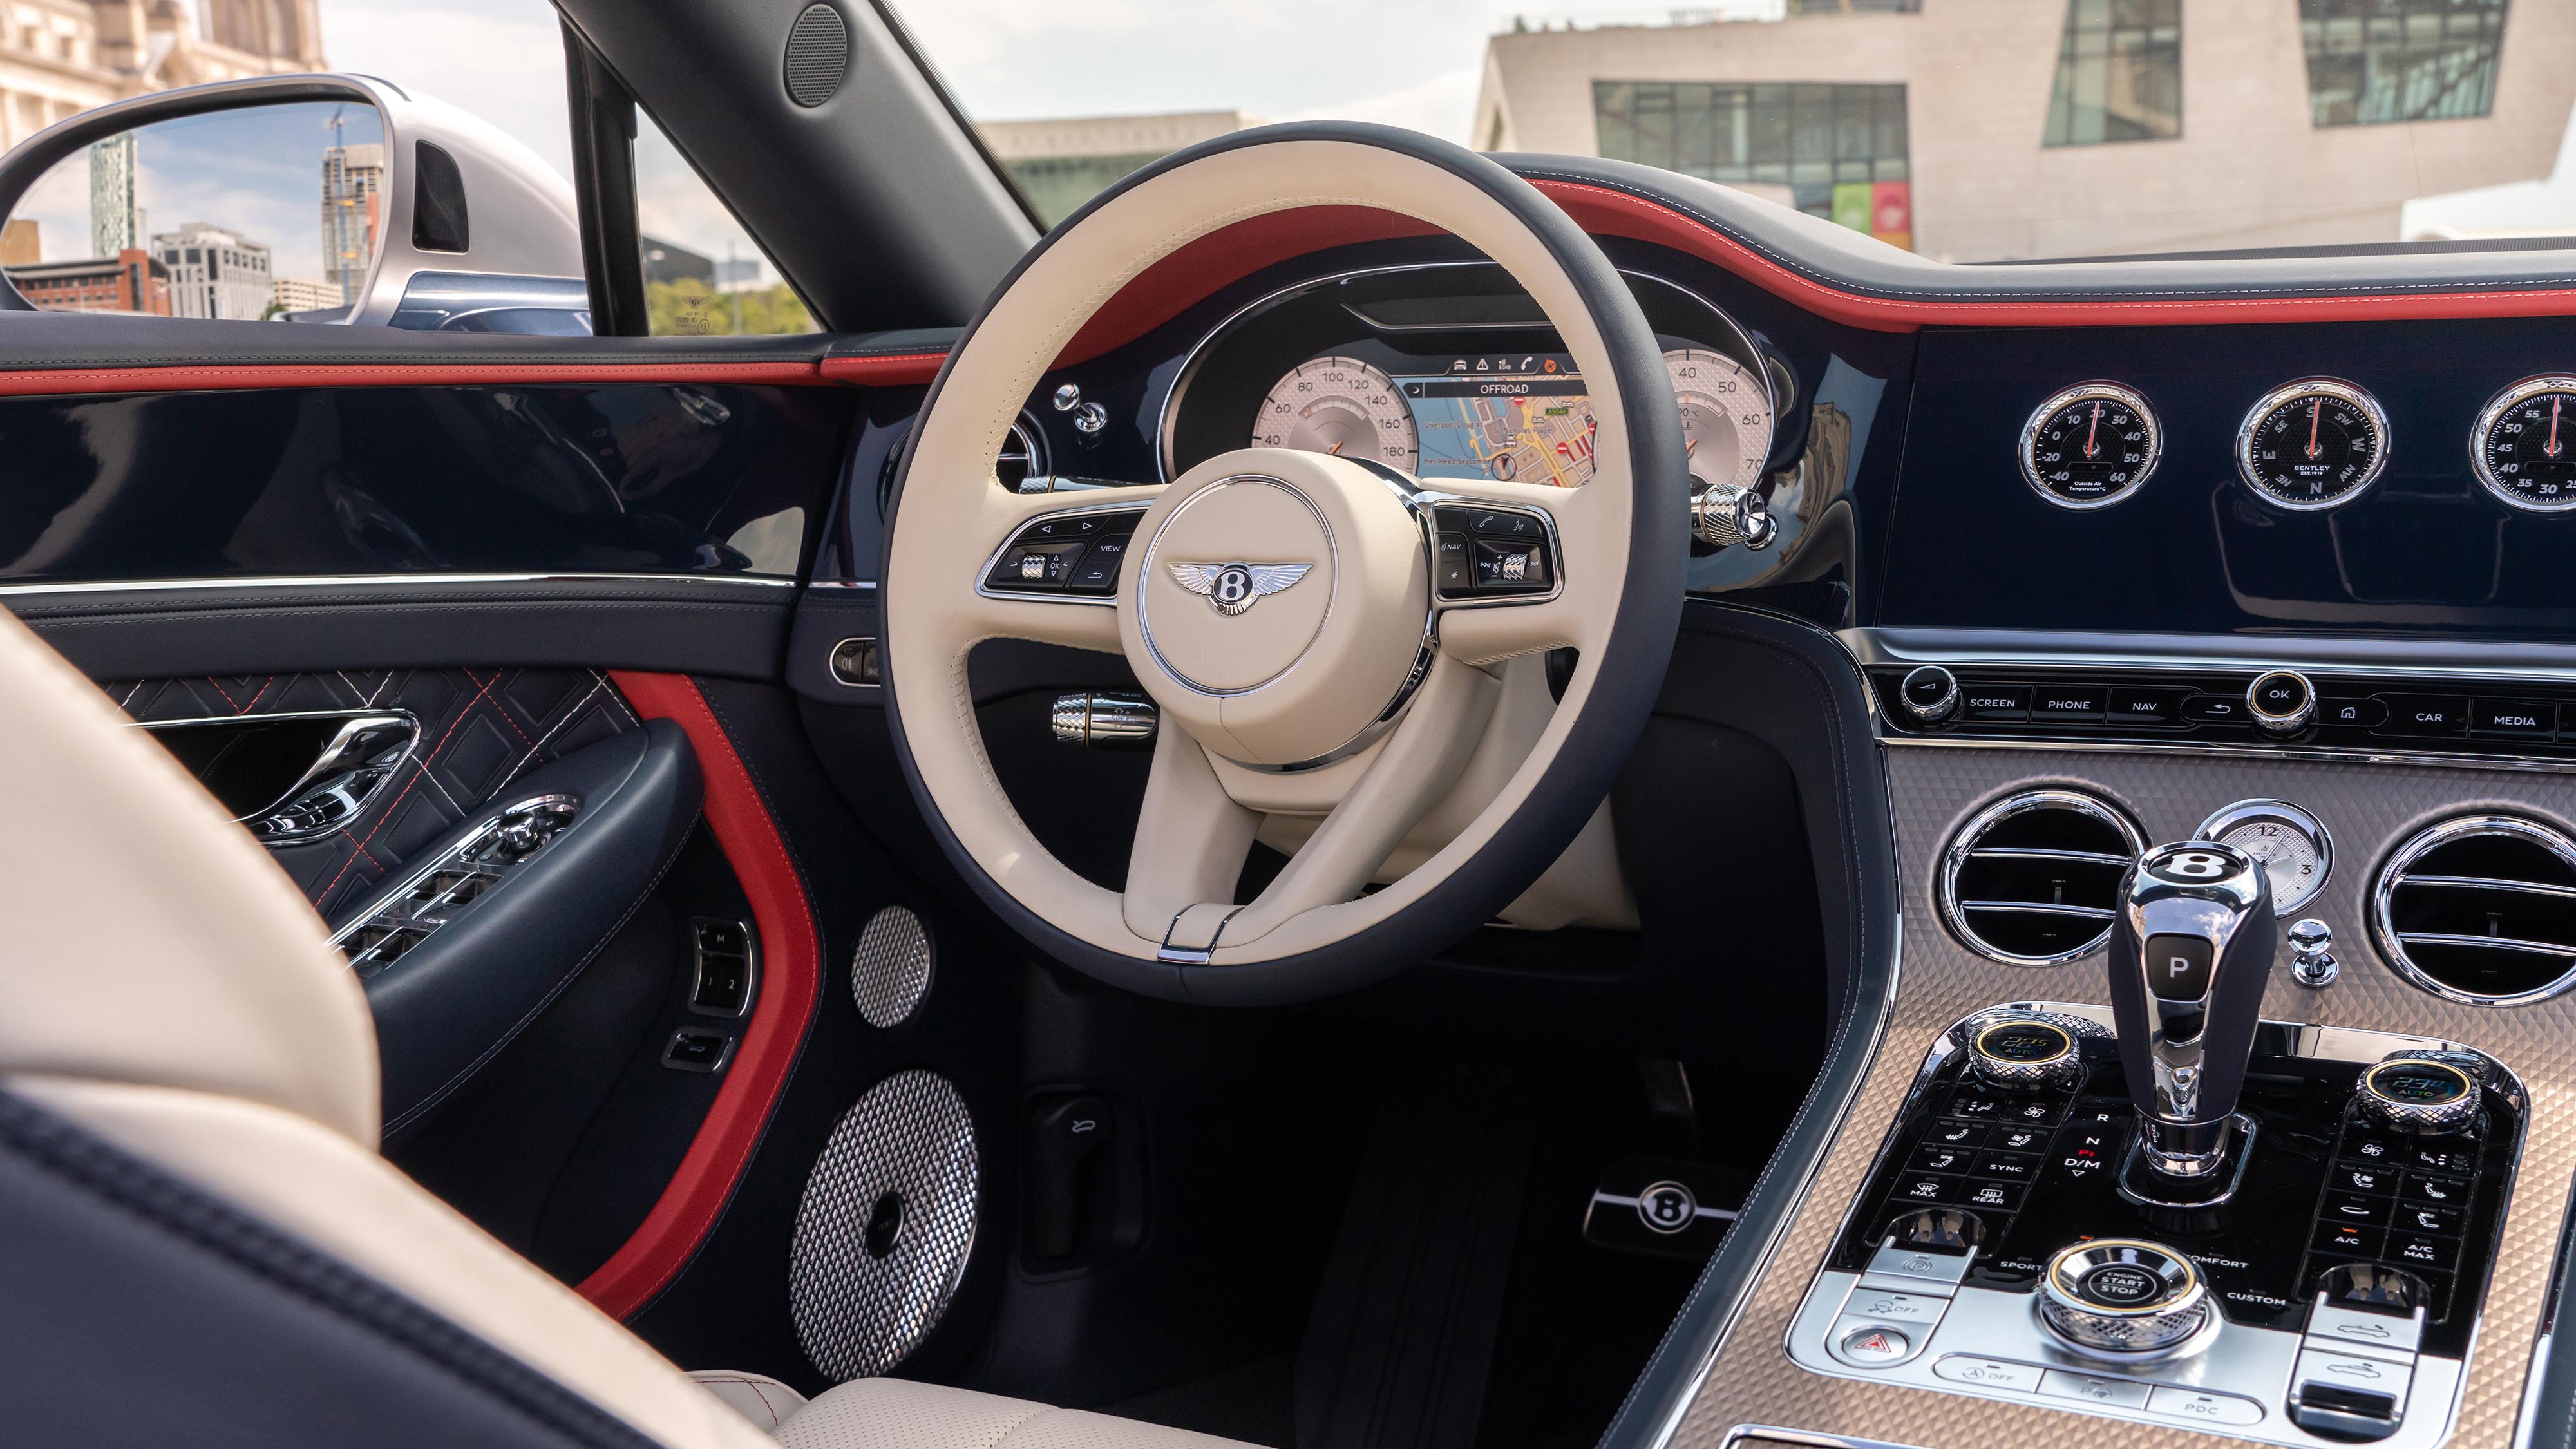 Bentley Continental Gt Mulliner Convertible 2020 4k Interior Wallpaper Hd Car Wallpapers Id 15467